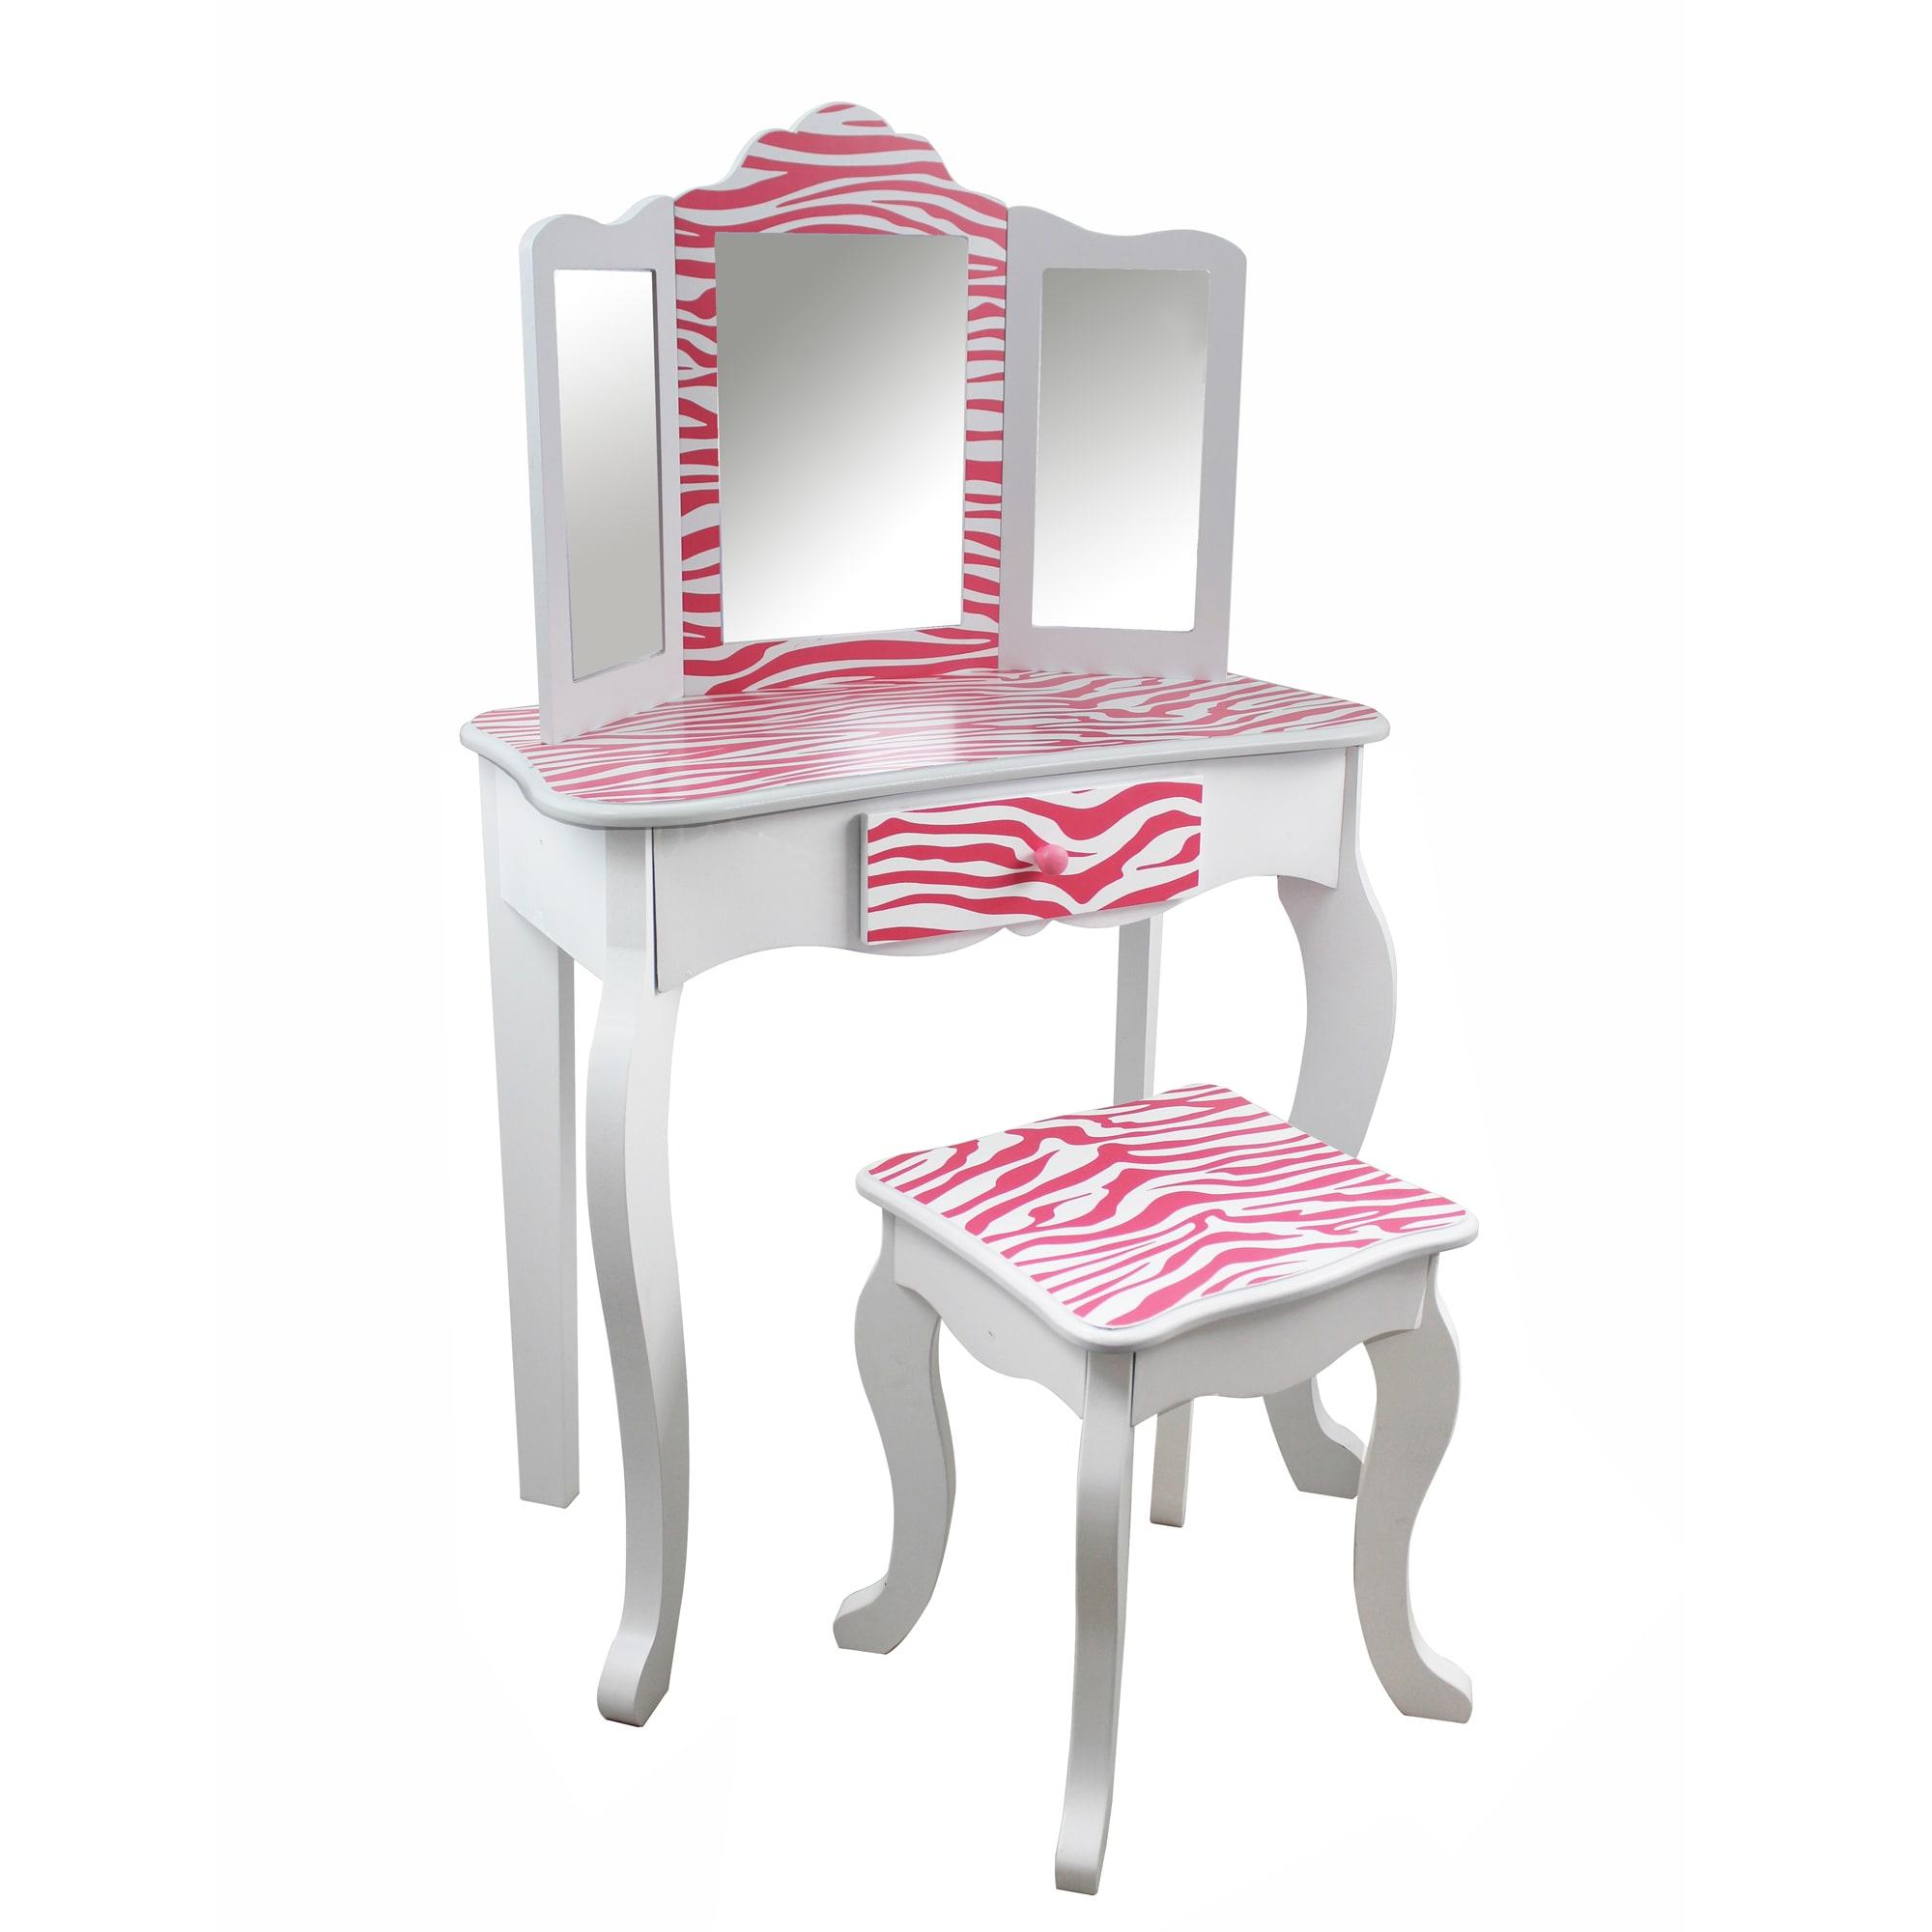 Teamson Kids - Zebra Vanity Table & Stool Set, White